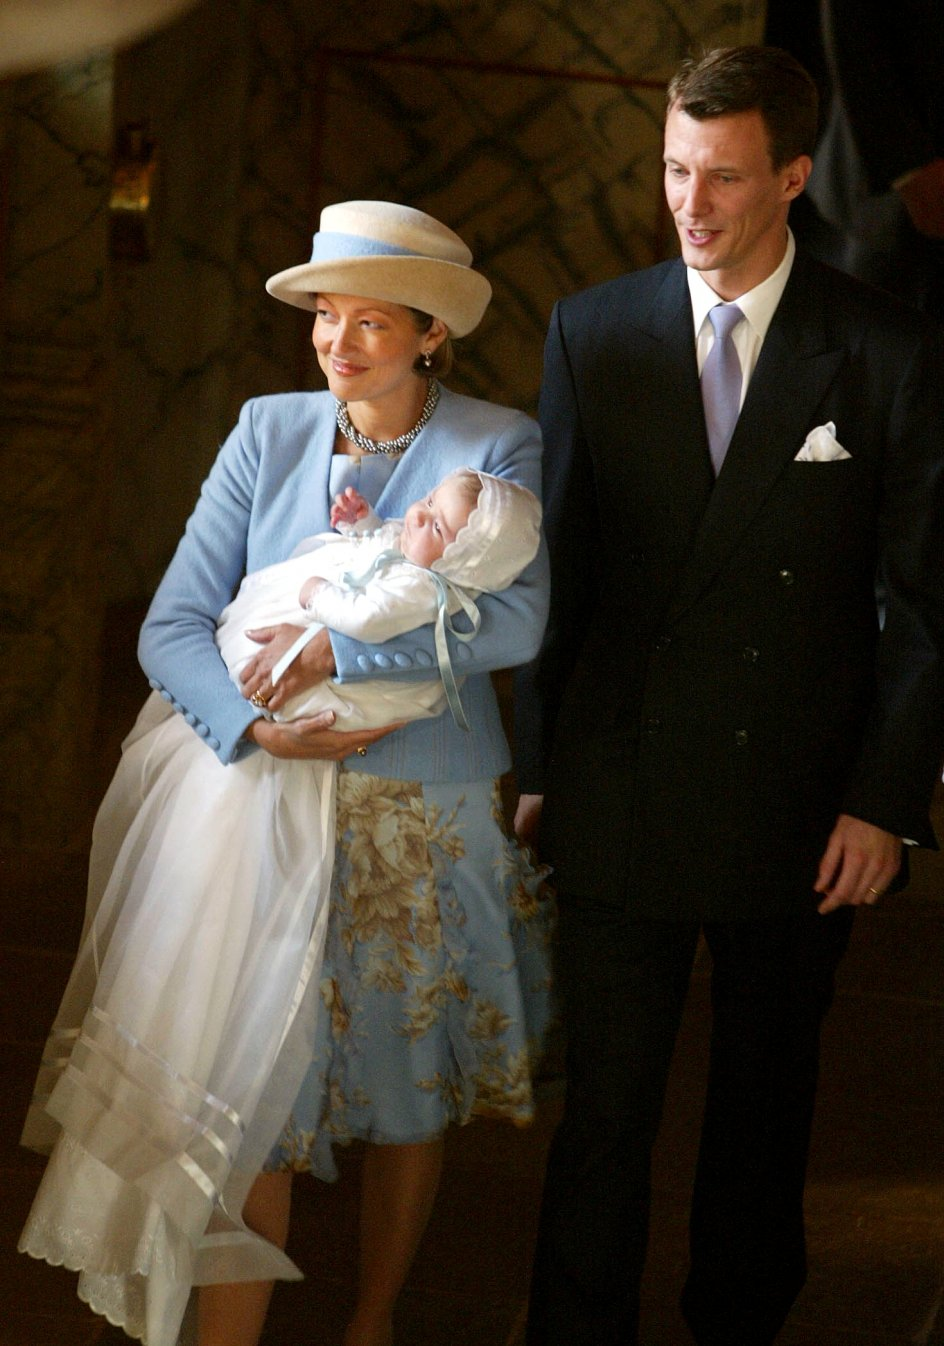 Prinsesse Alexandra med prins Felix og prins Joachim til barnedåben i Møgeltønder kirke.